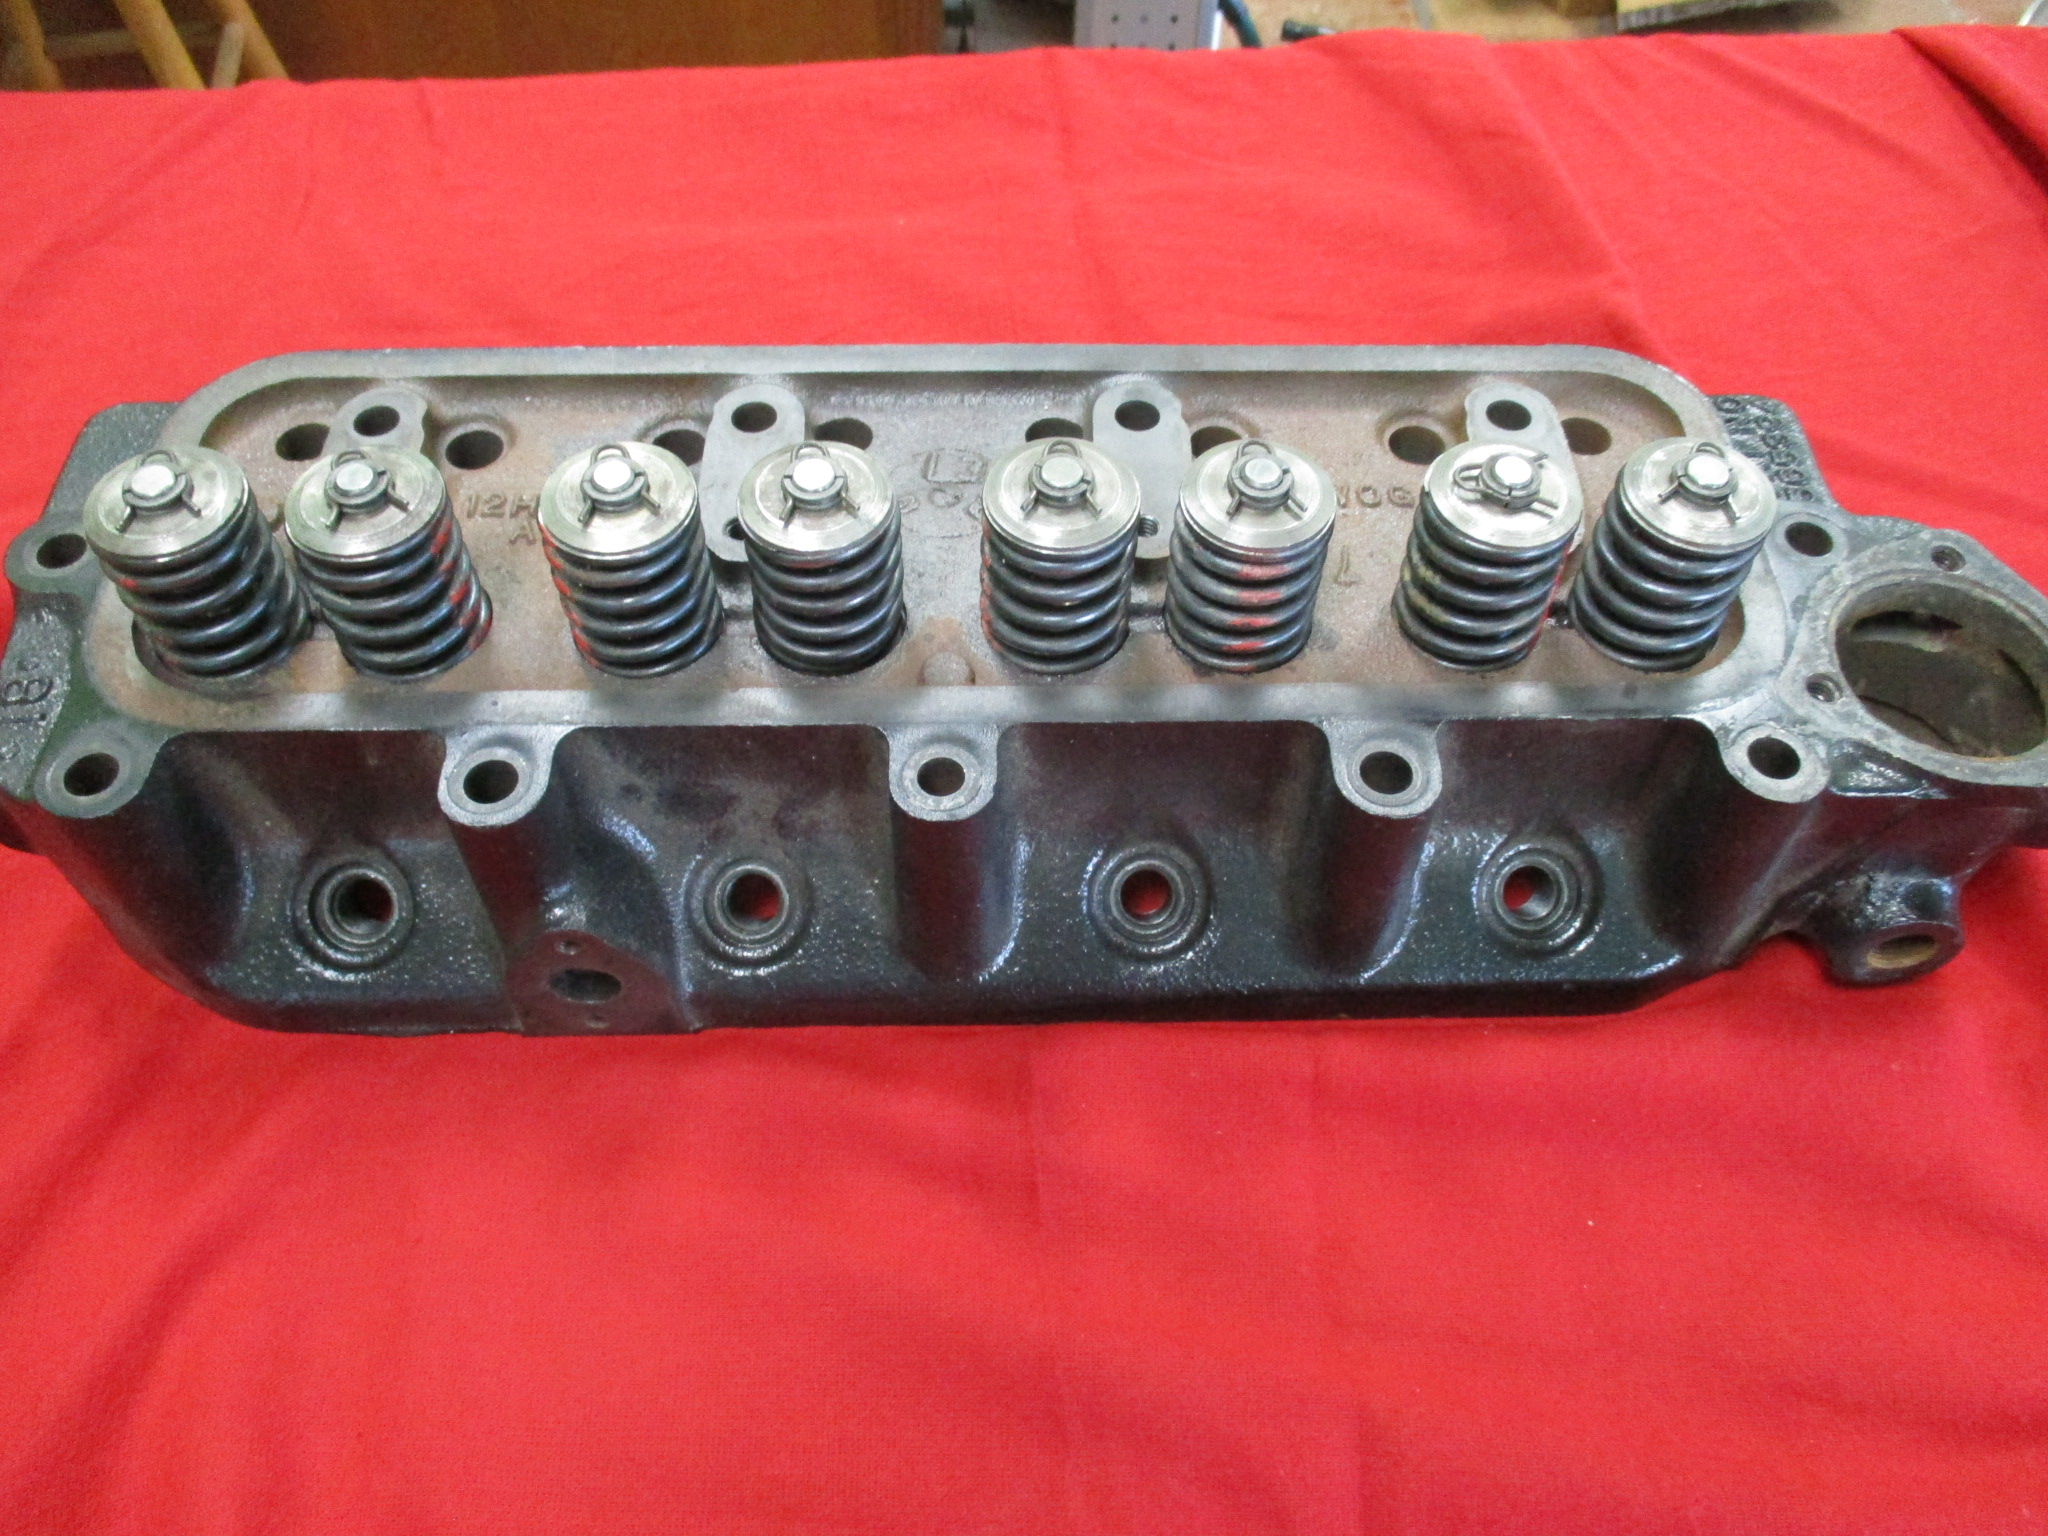 Parts for Jaguar, Austin Healey, MG, Triumph, Austin Healey and